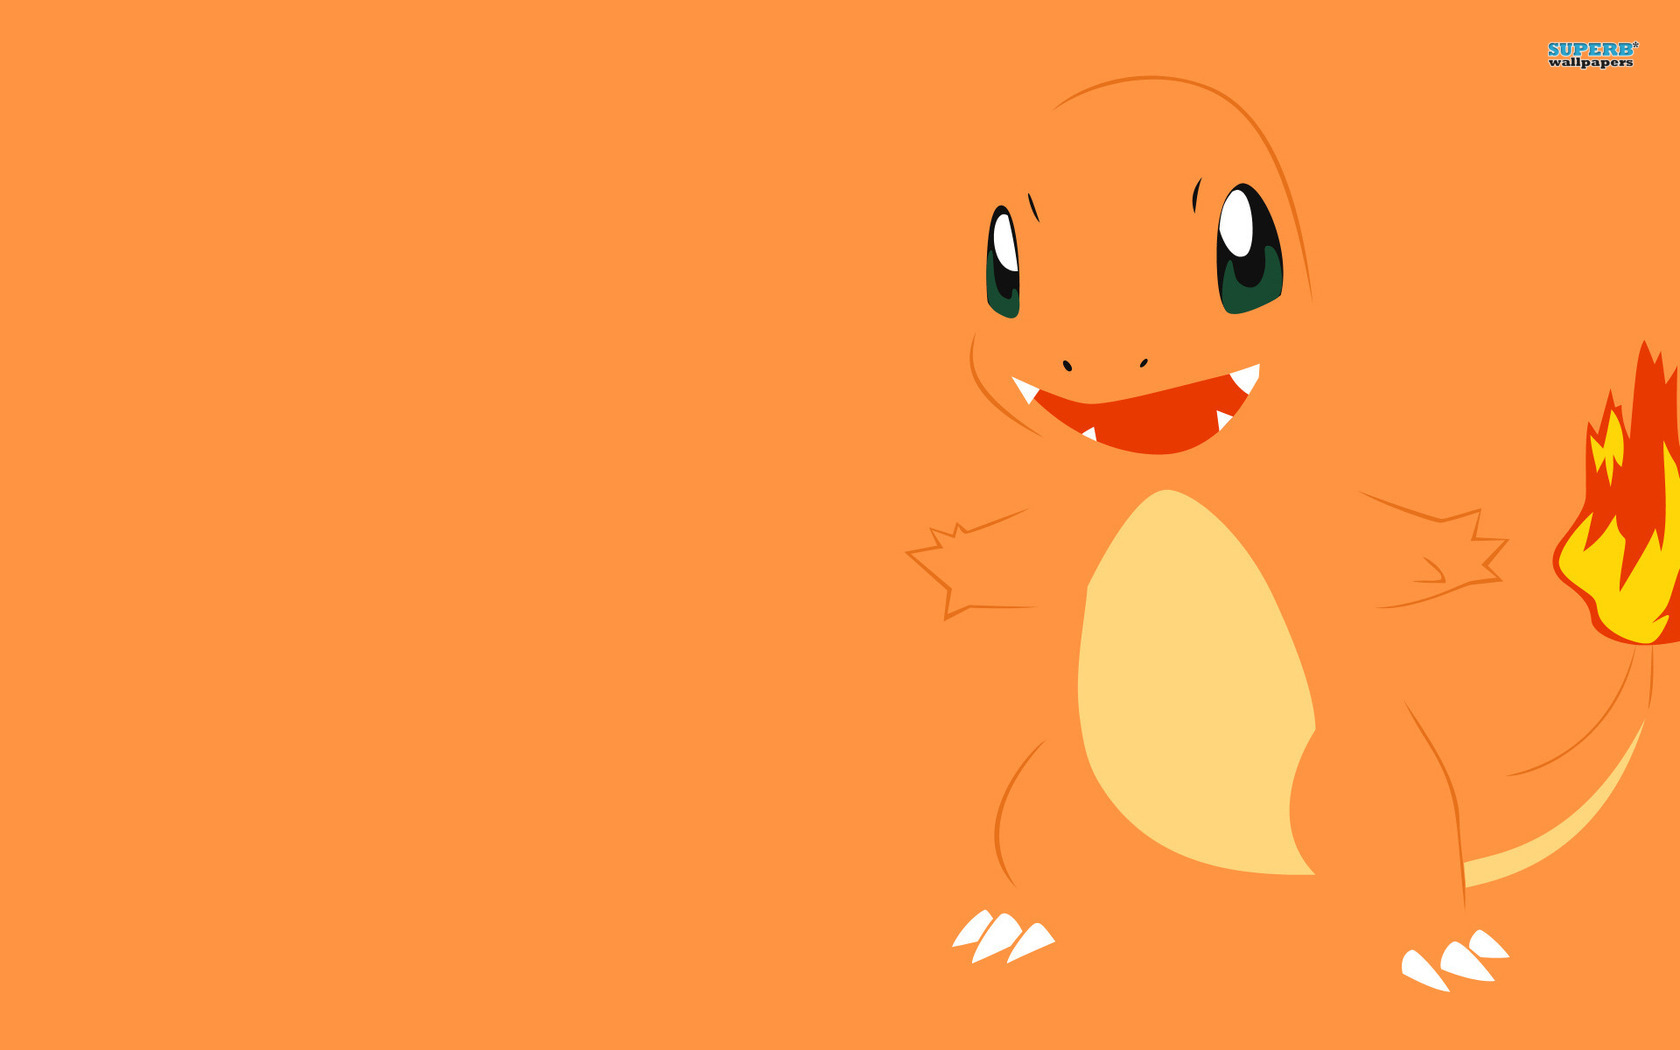 Pokemon Minimalist Charmander Minimalistic 78274 With Resolutions 1680 1680x1050